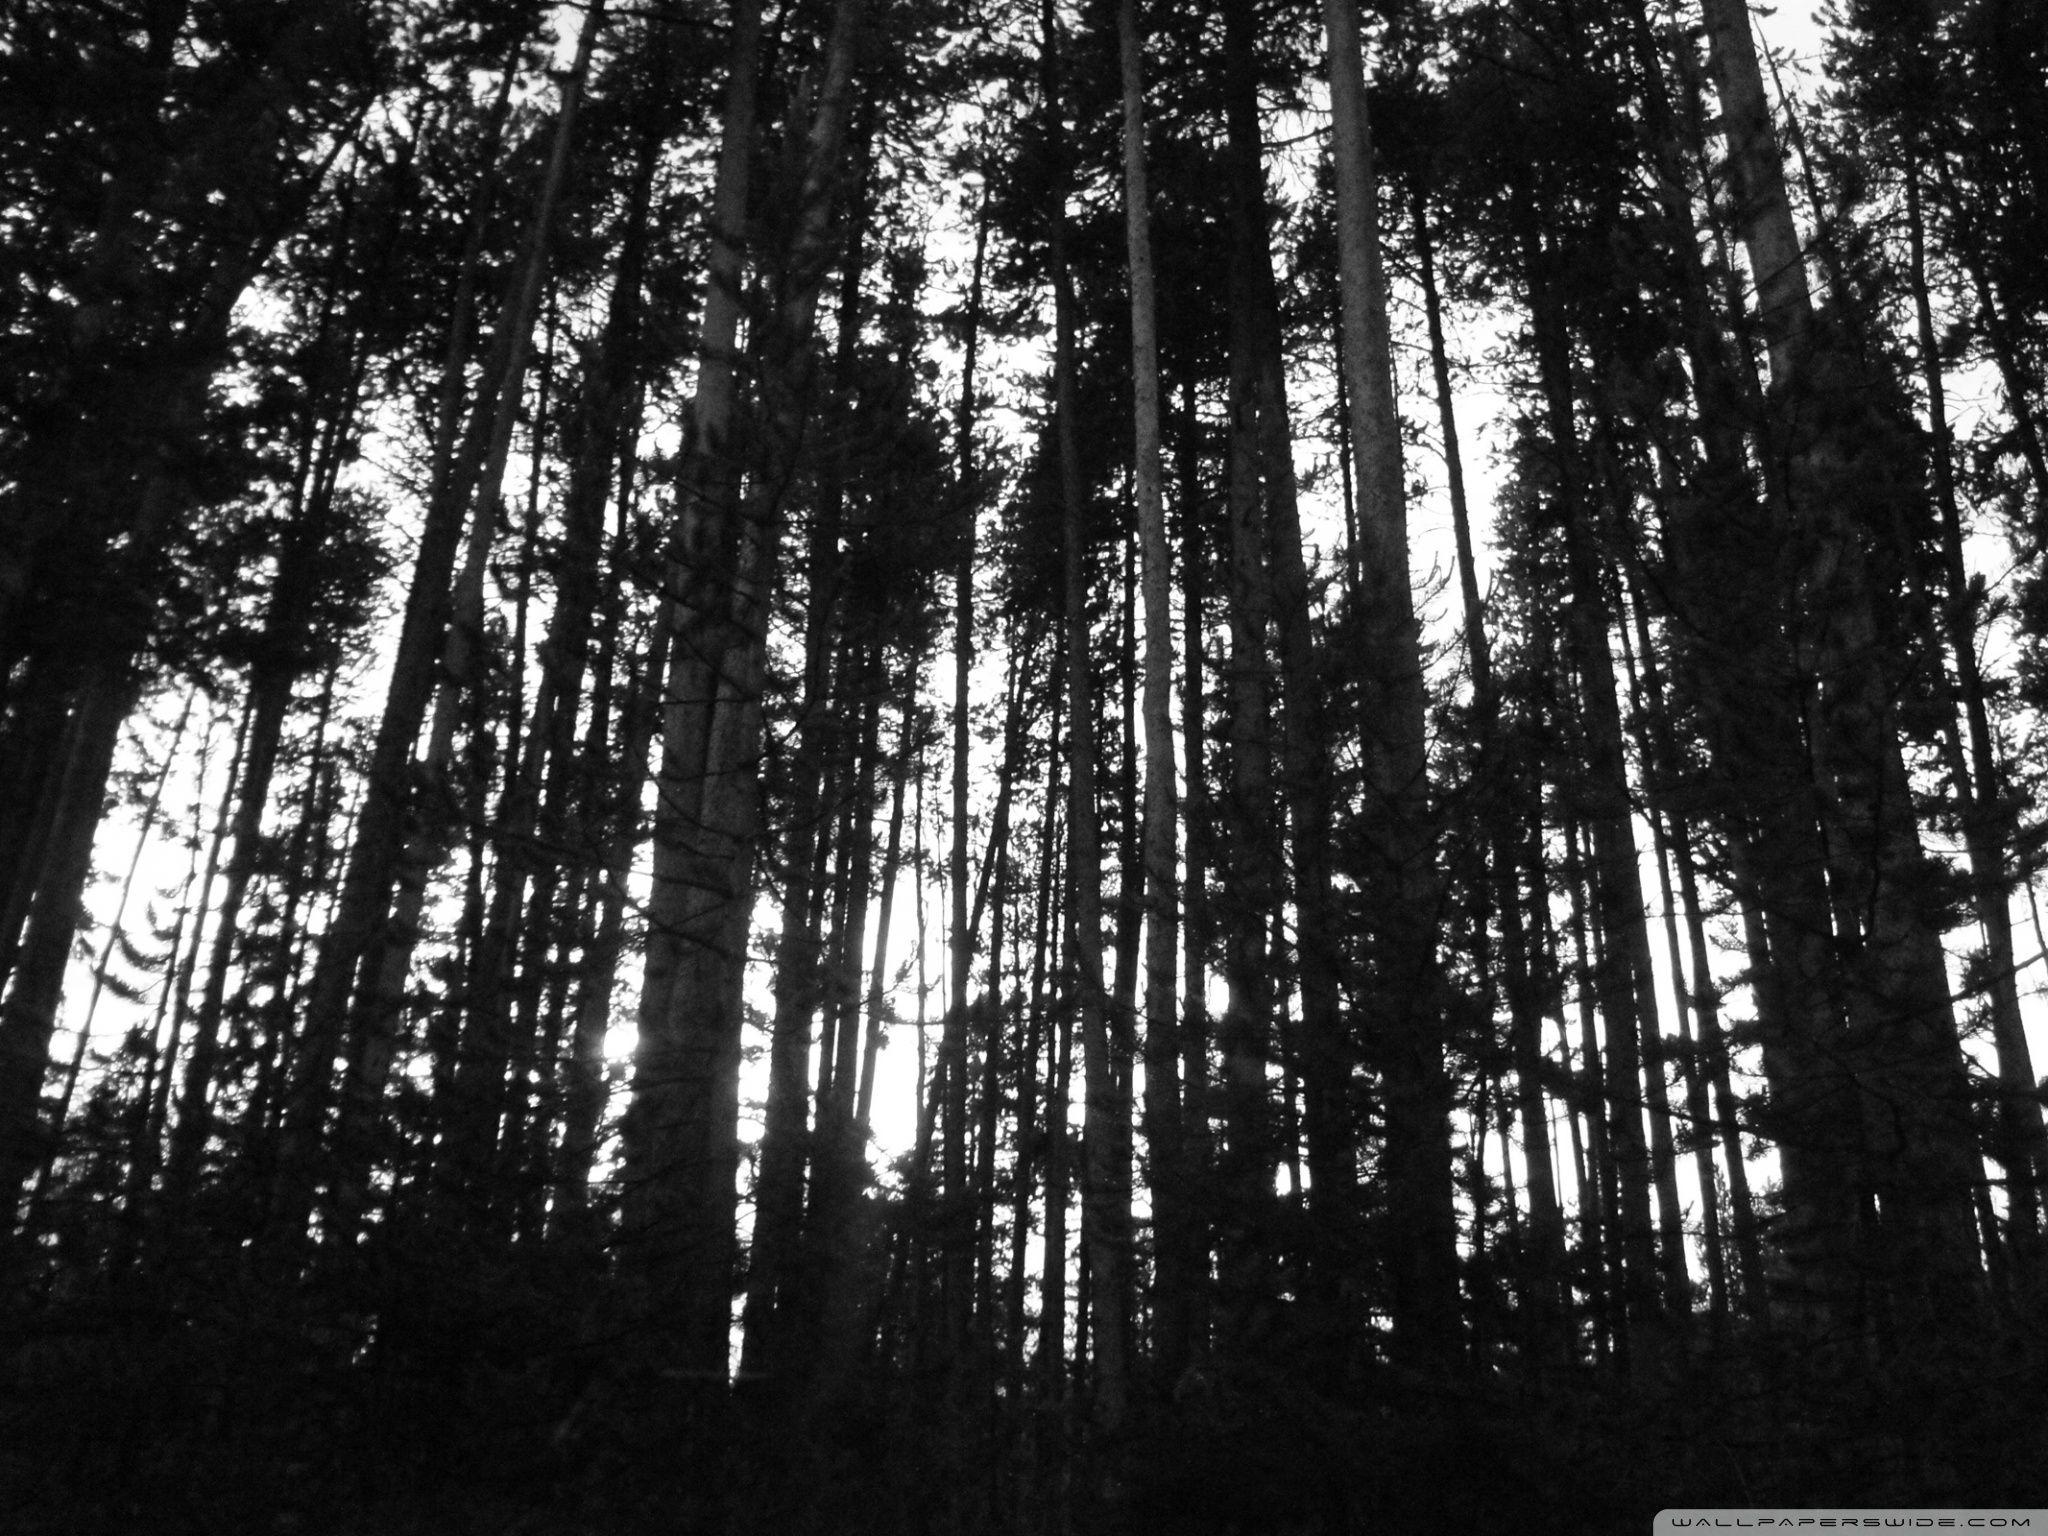 Pin By Beth Maddox On Shadows At Play Black And White Tree White Tree Black Tree